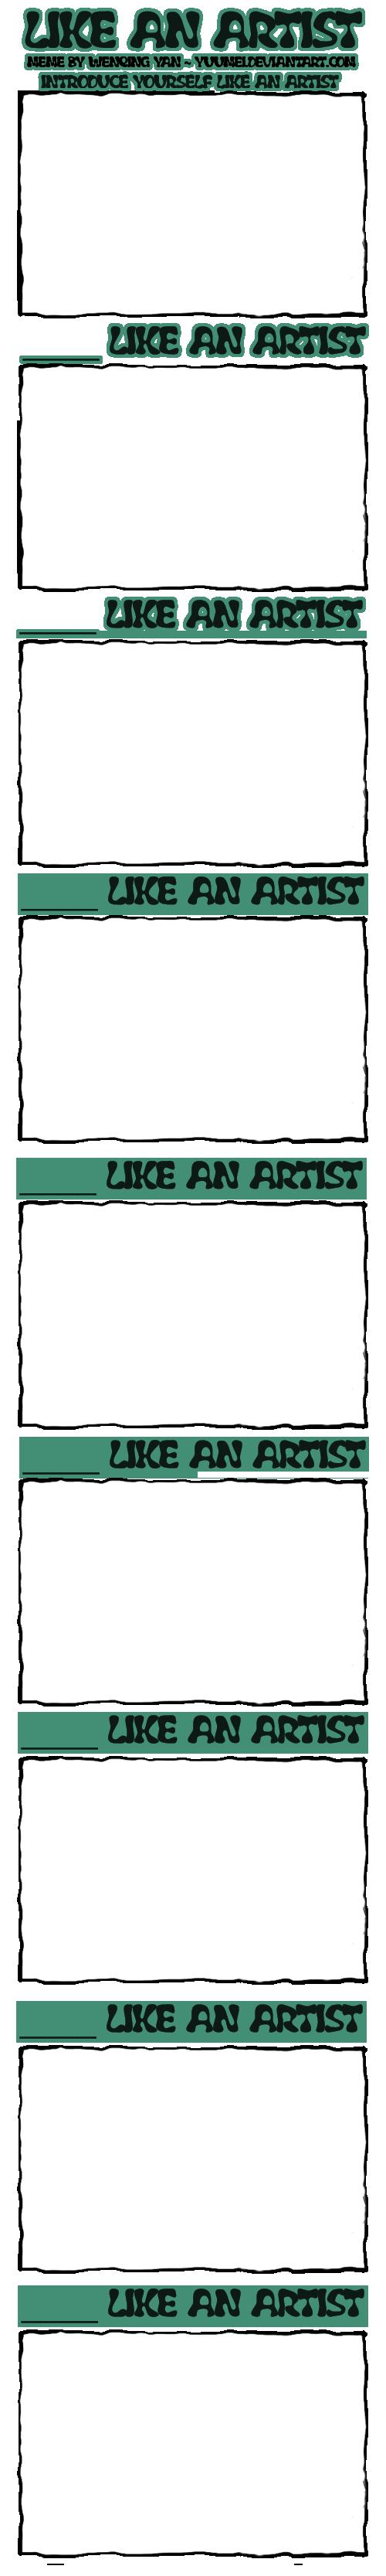 LIKE AN ARTIST Meme n Contest by yuumei